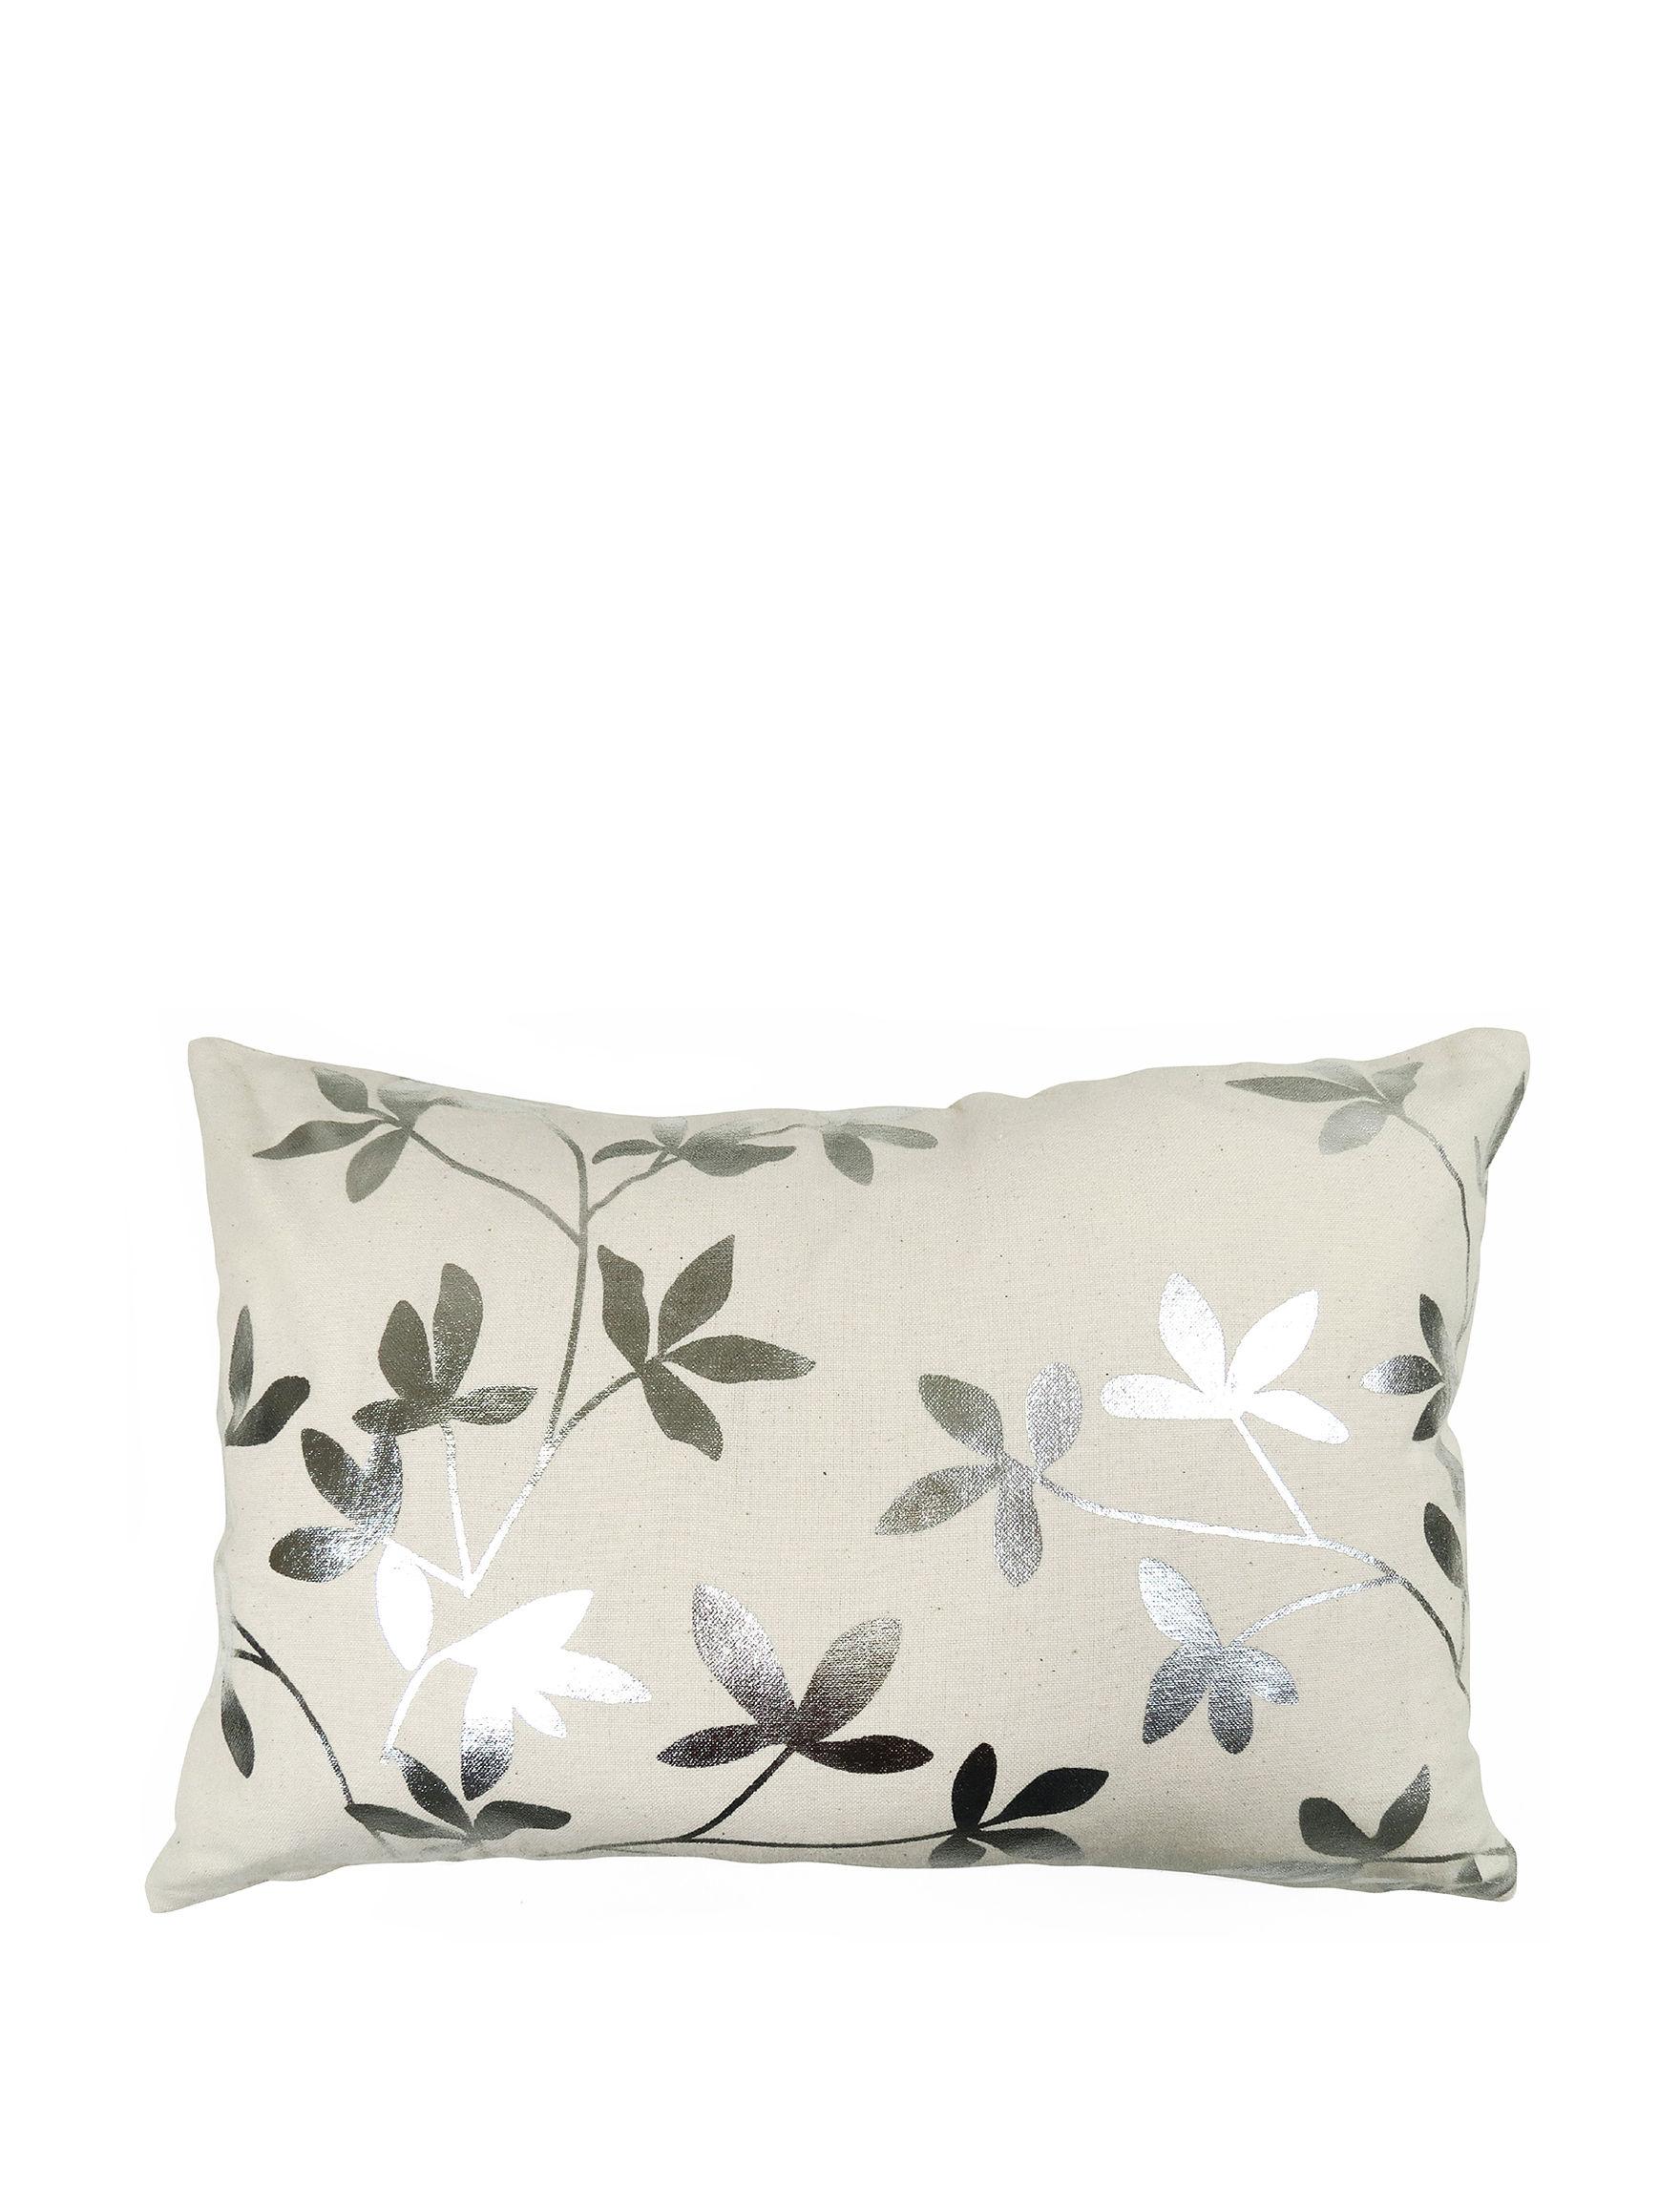 Park B. Smith Natural Decorative Pillows